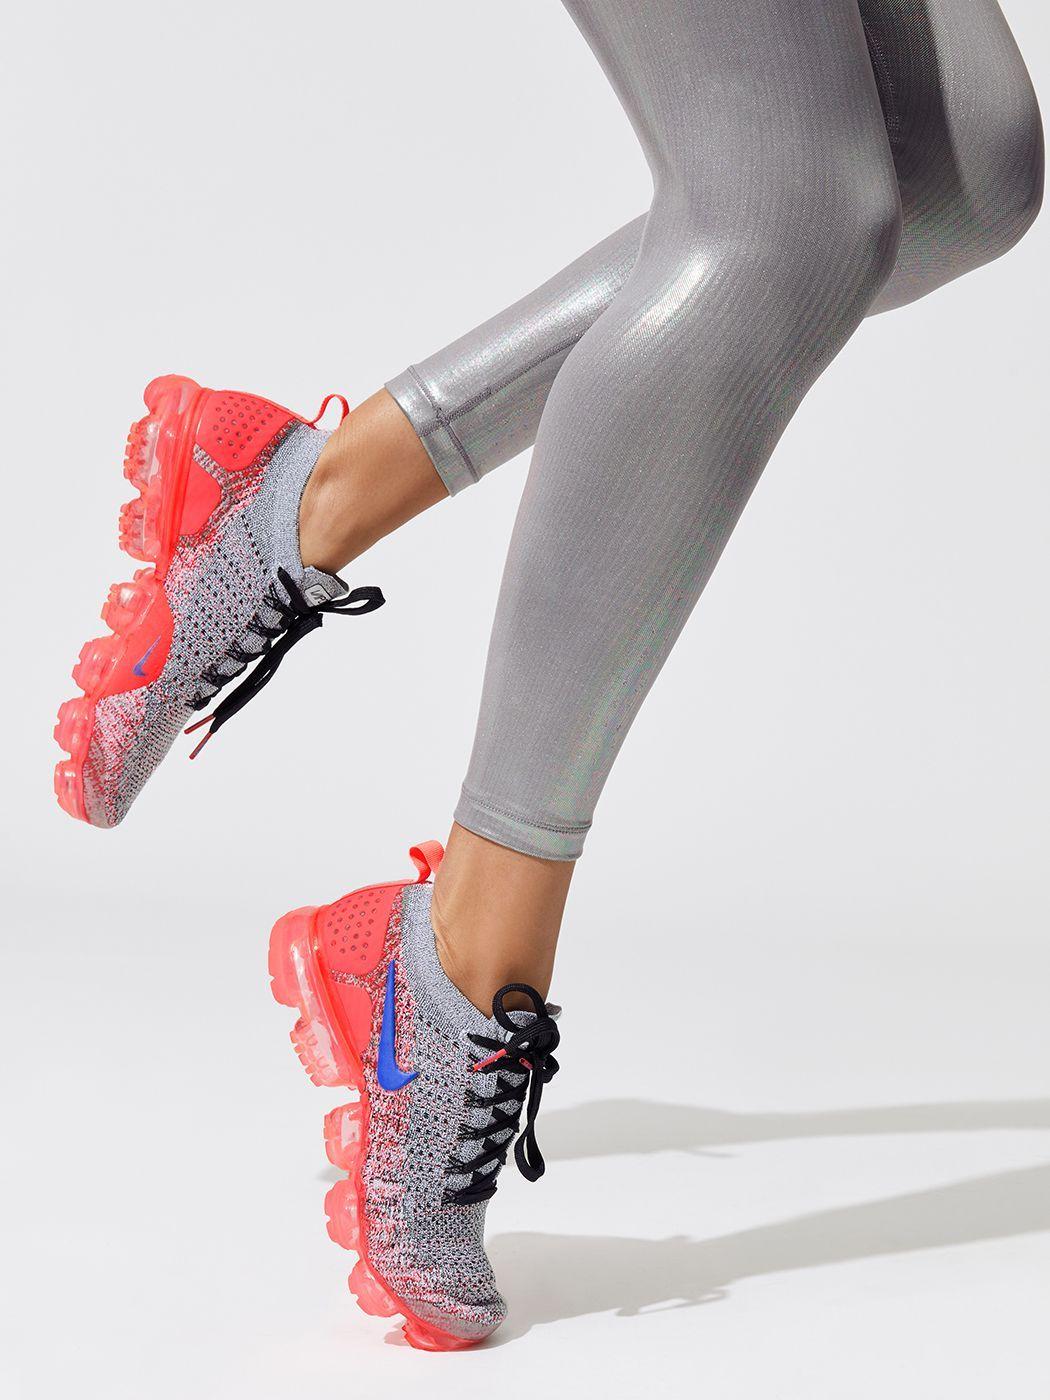 3381a6d066d5f W Nike Air Vapormax Flyknit 2 in White ultramarine-hot Punch-black